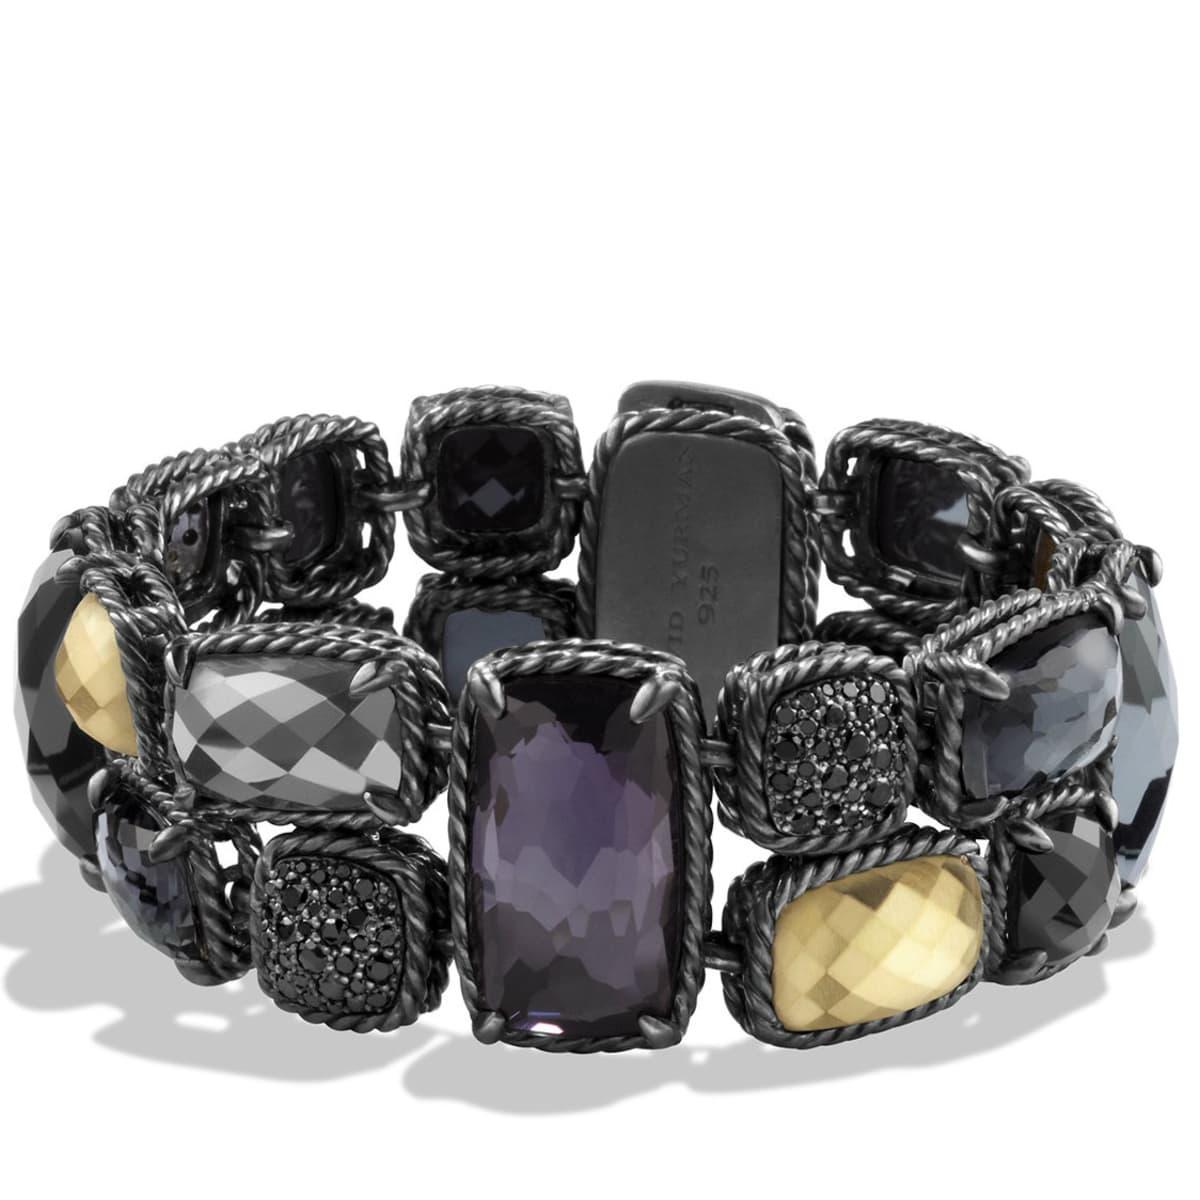 David Yurman Midnight Ice collection bracelet